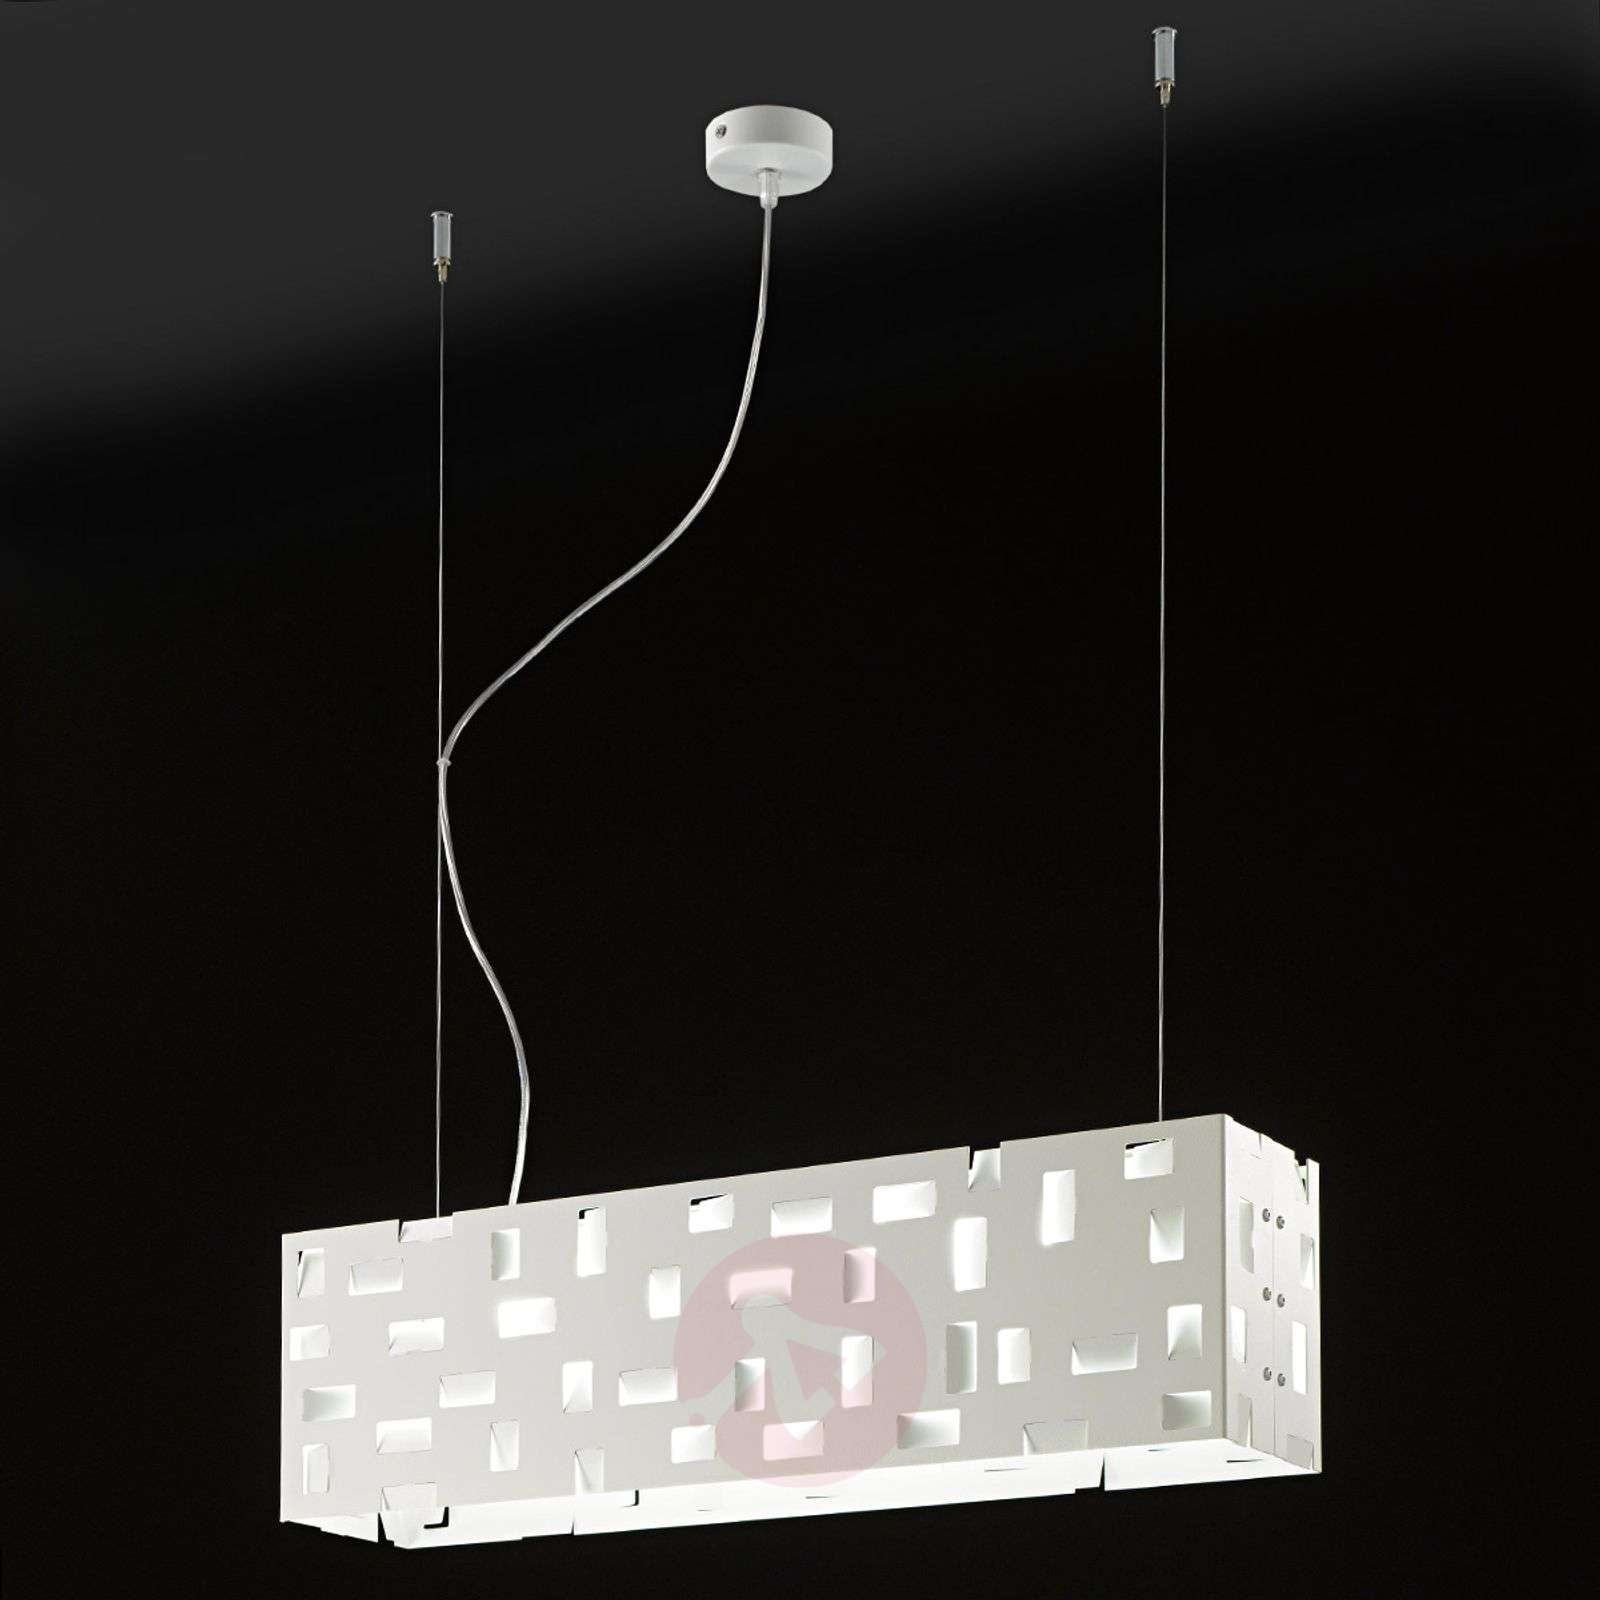 Designer hanging light berlino est with leds lights designer hanging light berlino est with leds 8525748 01 aloadofball Choice Image